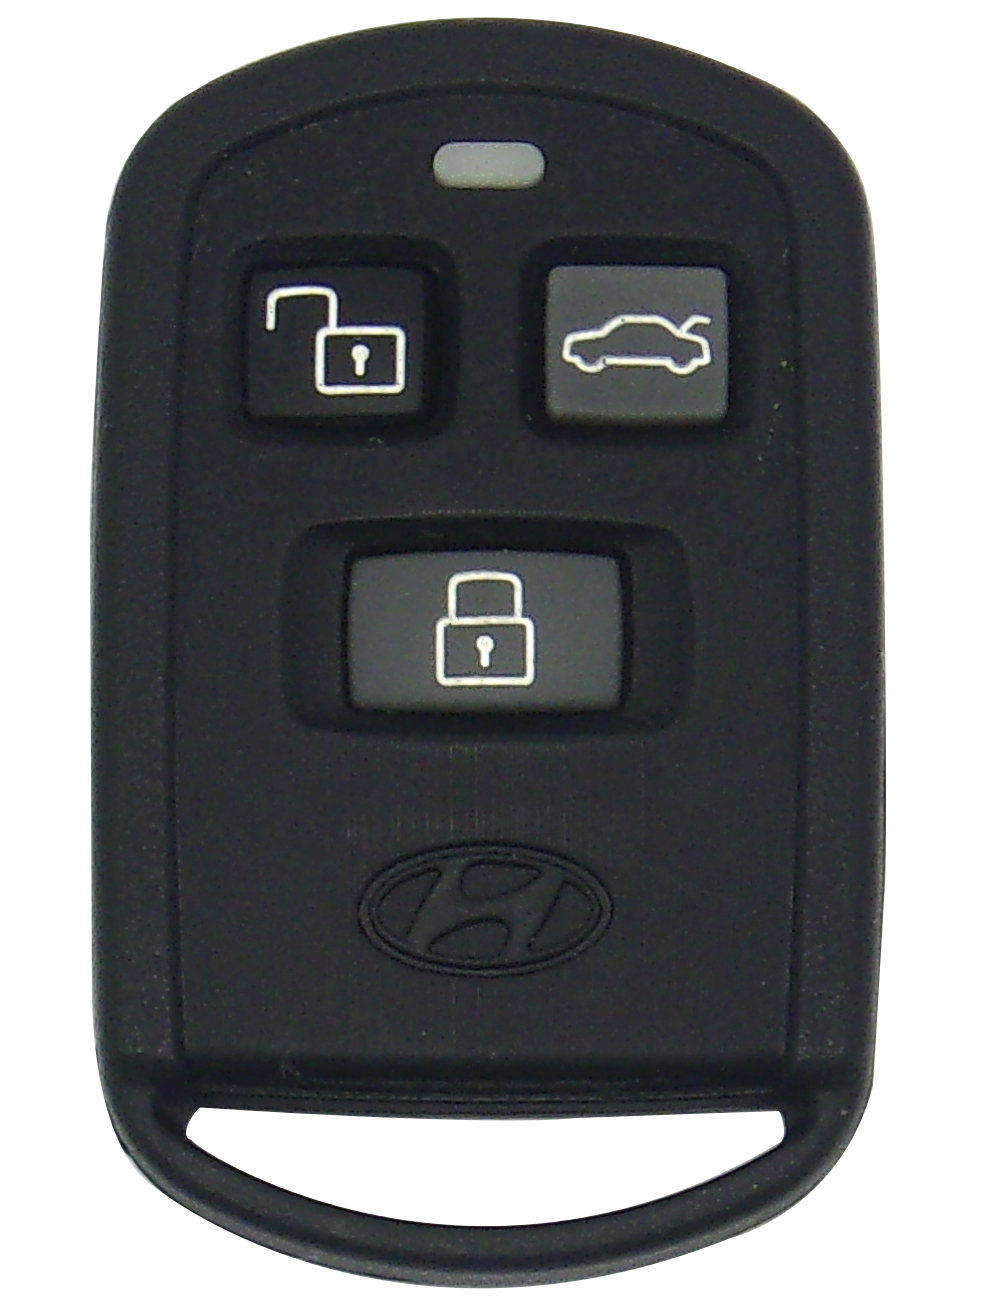 Hyundai Keyless Entry Car Remote - 3 Button